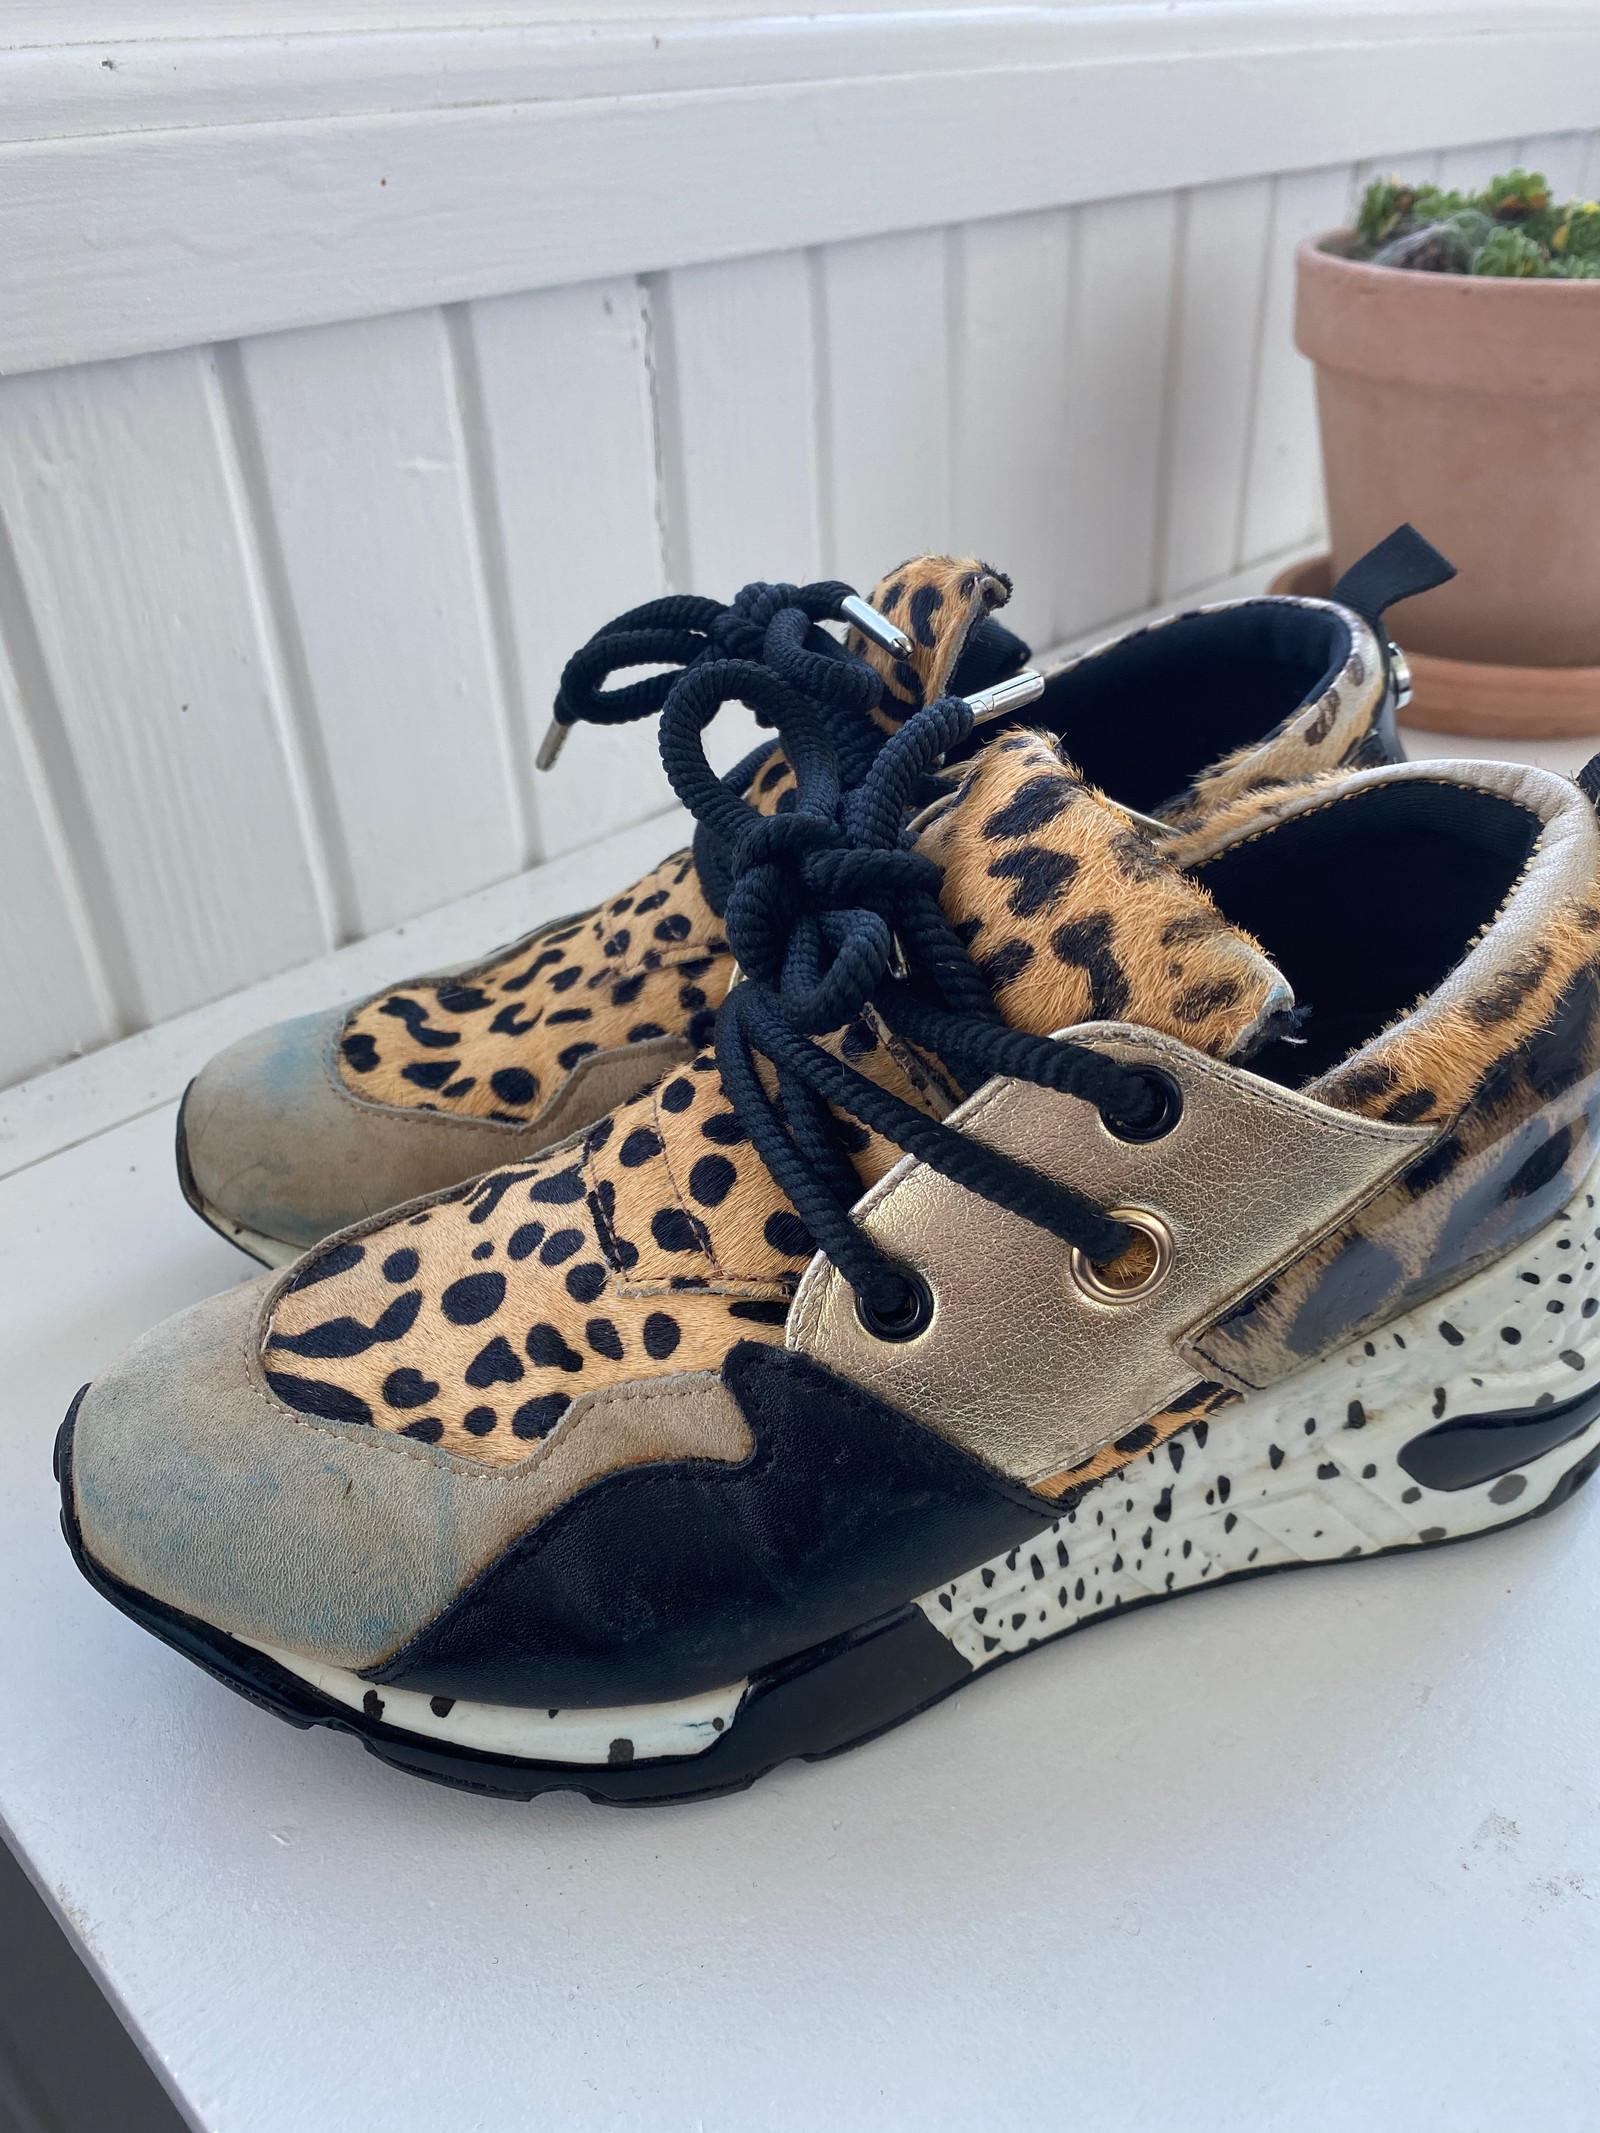 steve madden sko danmark